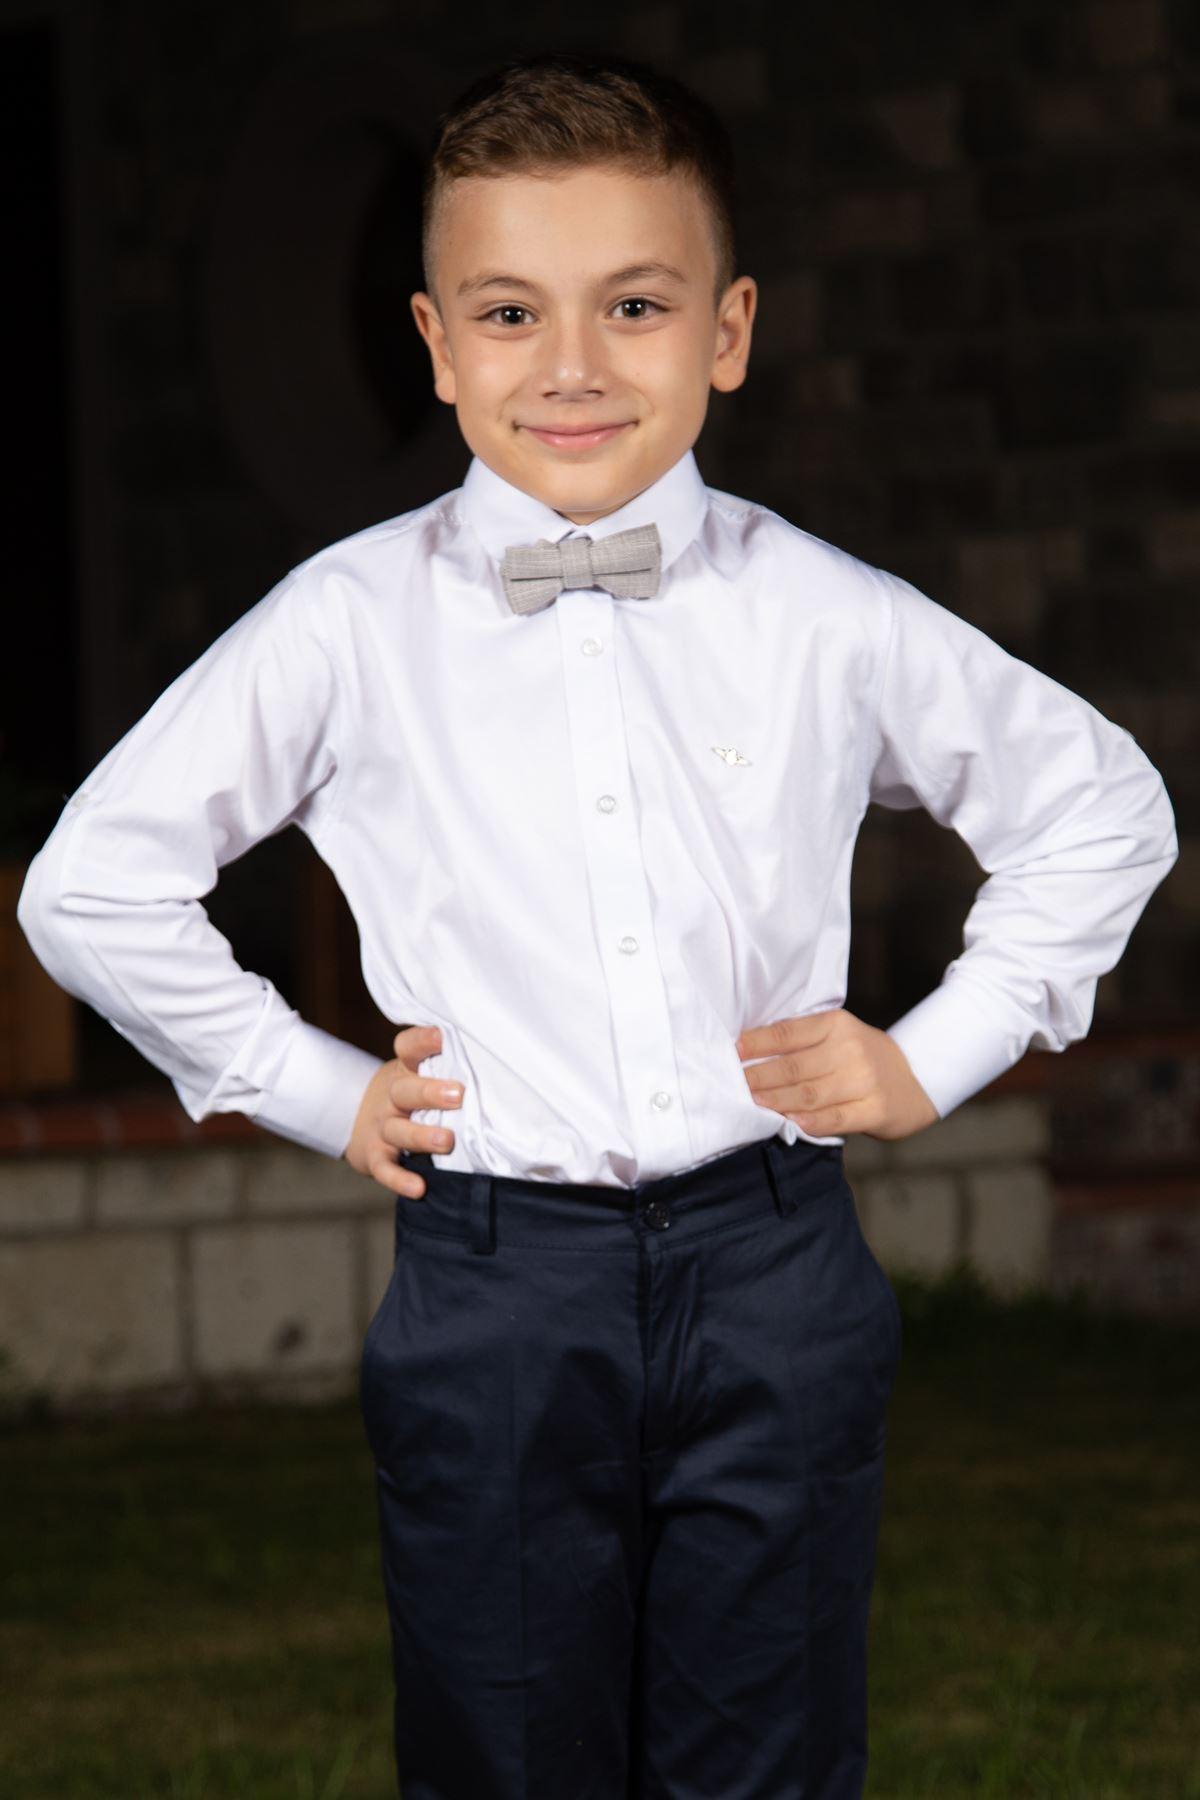 Normaler Hals, Baumwollsatin, Rosette detailliert, Boy Shirt 1007 Weiß